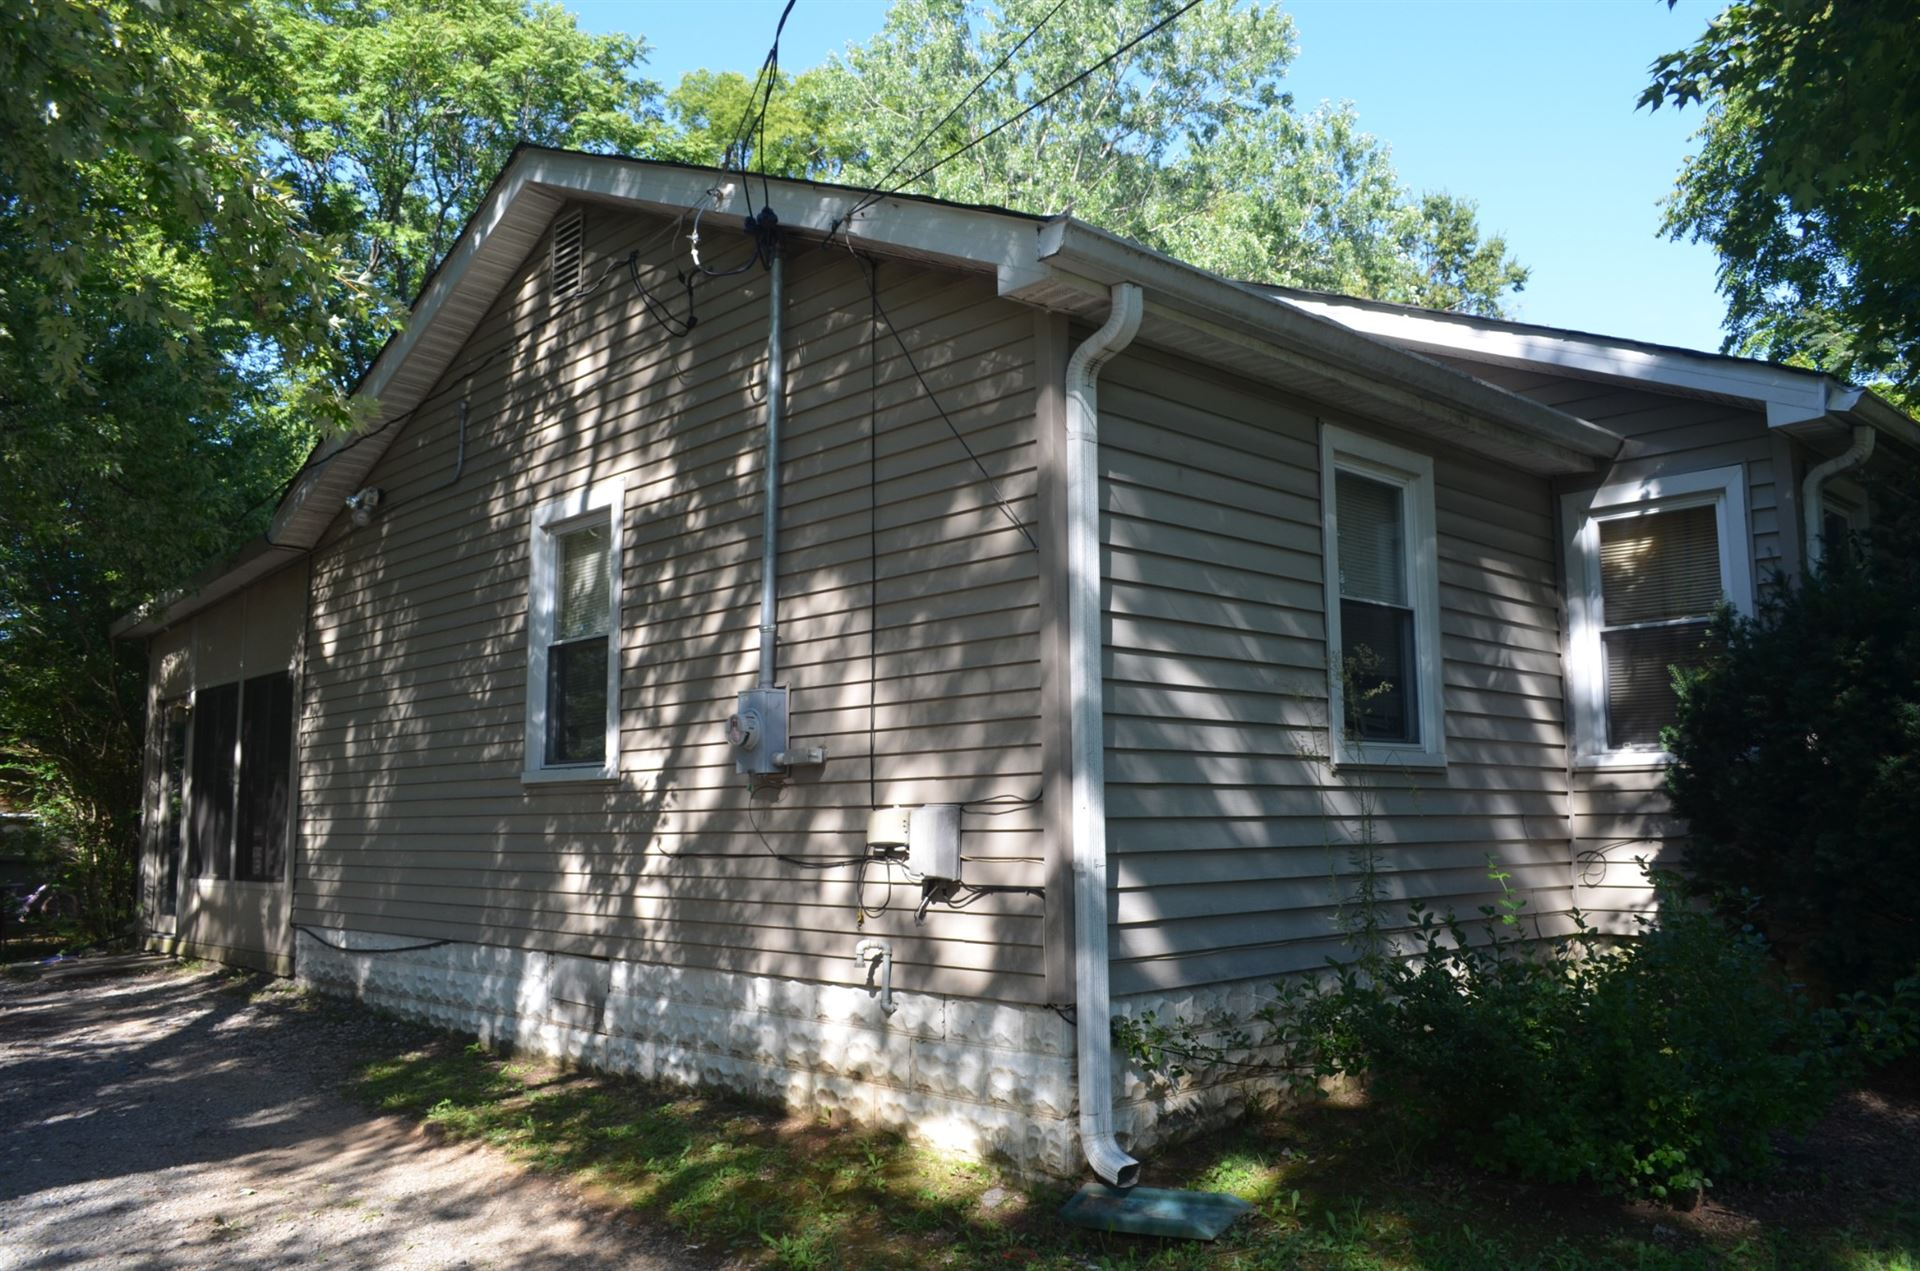 Photo of 918 Velma Ln, Murfreesboro, TN 37129 (MLS # 2288655)